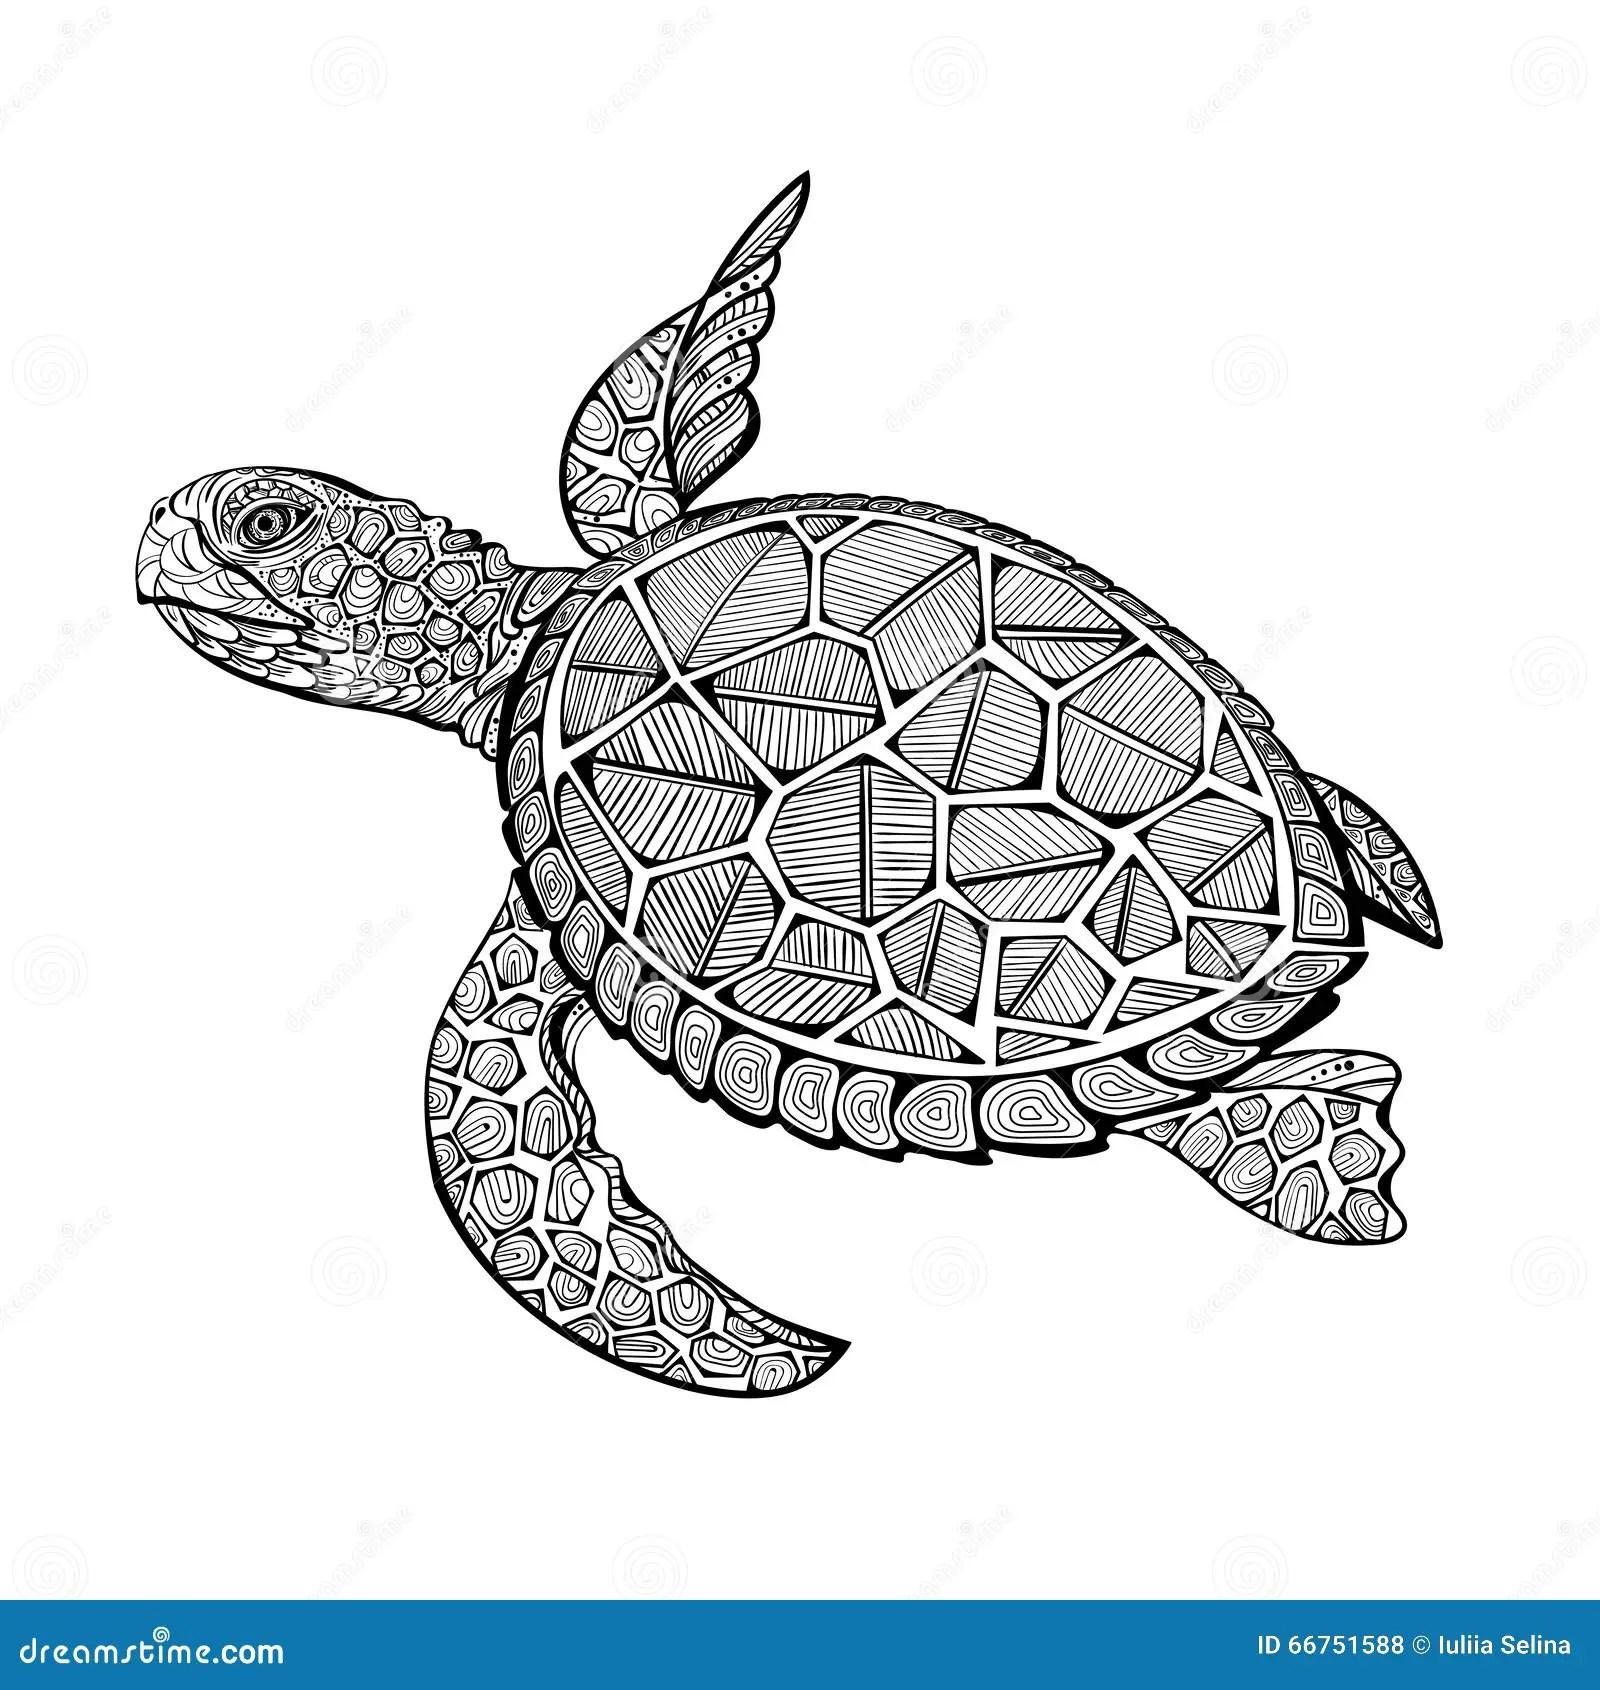 sea turtle mandala coloring pages. Black Bedroom Furniture Sets. Home Design Ideas